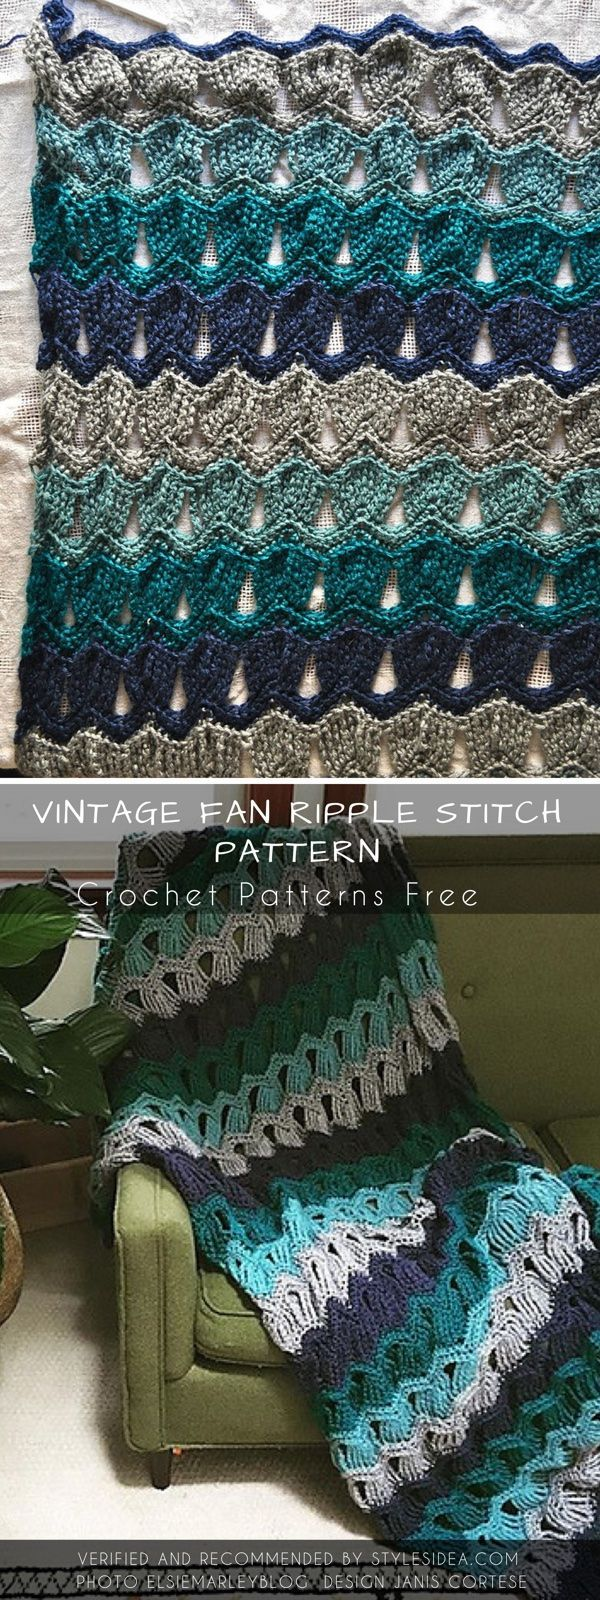 Vintage Fan Ripple Stitch Crochet Pattern Free | Pinterest | Vintage ...